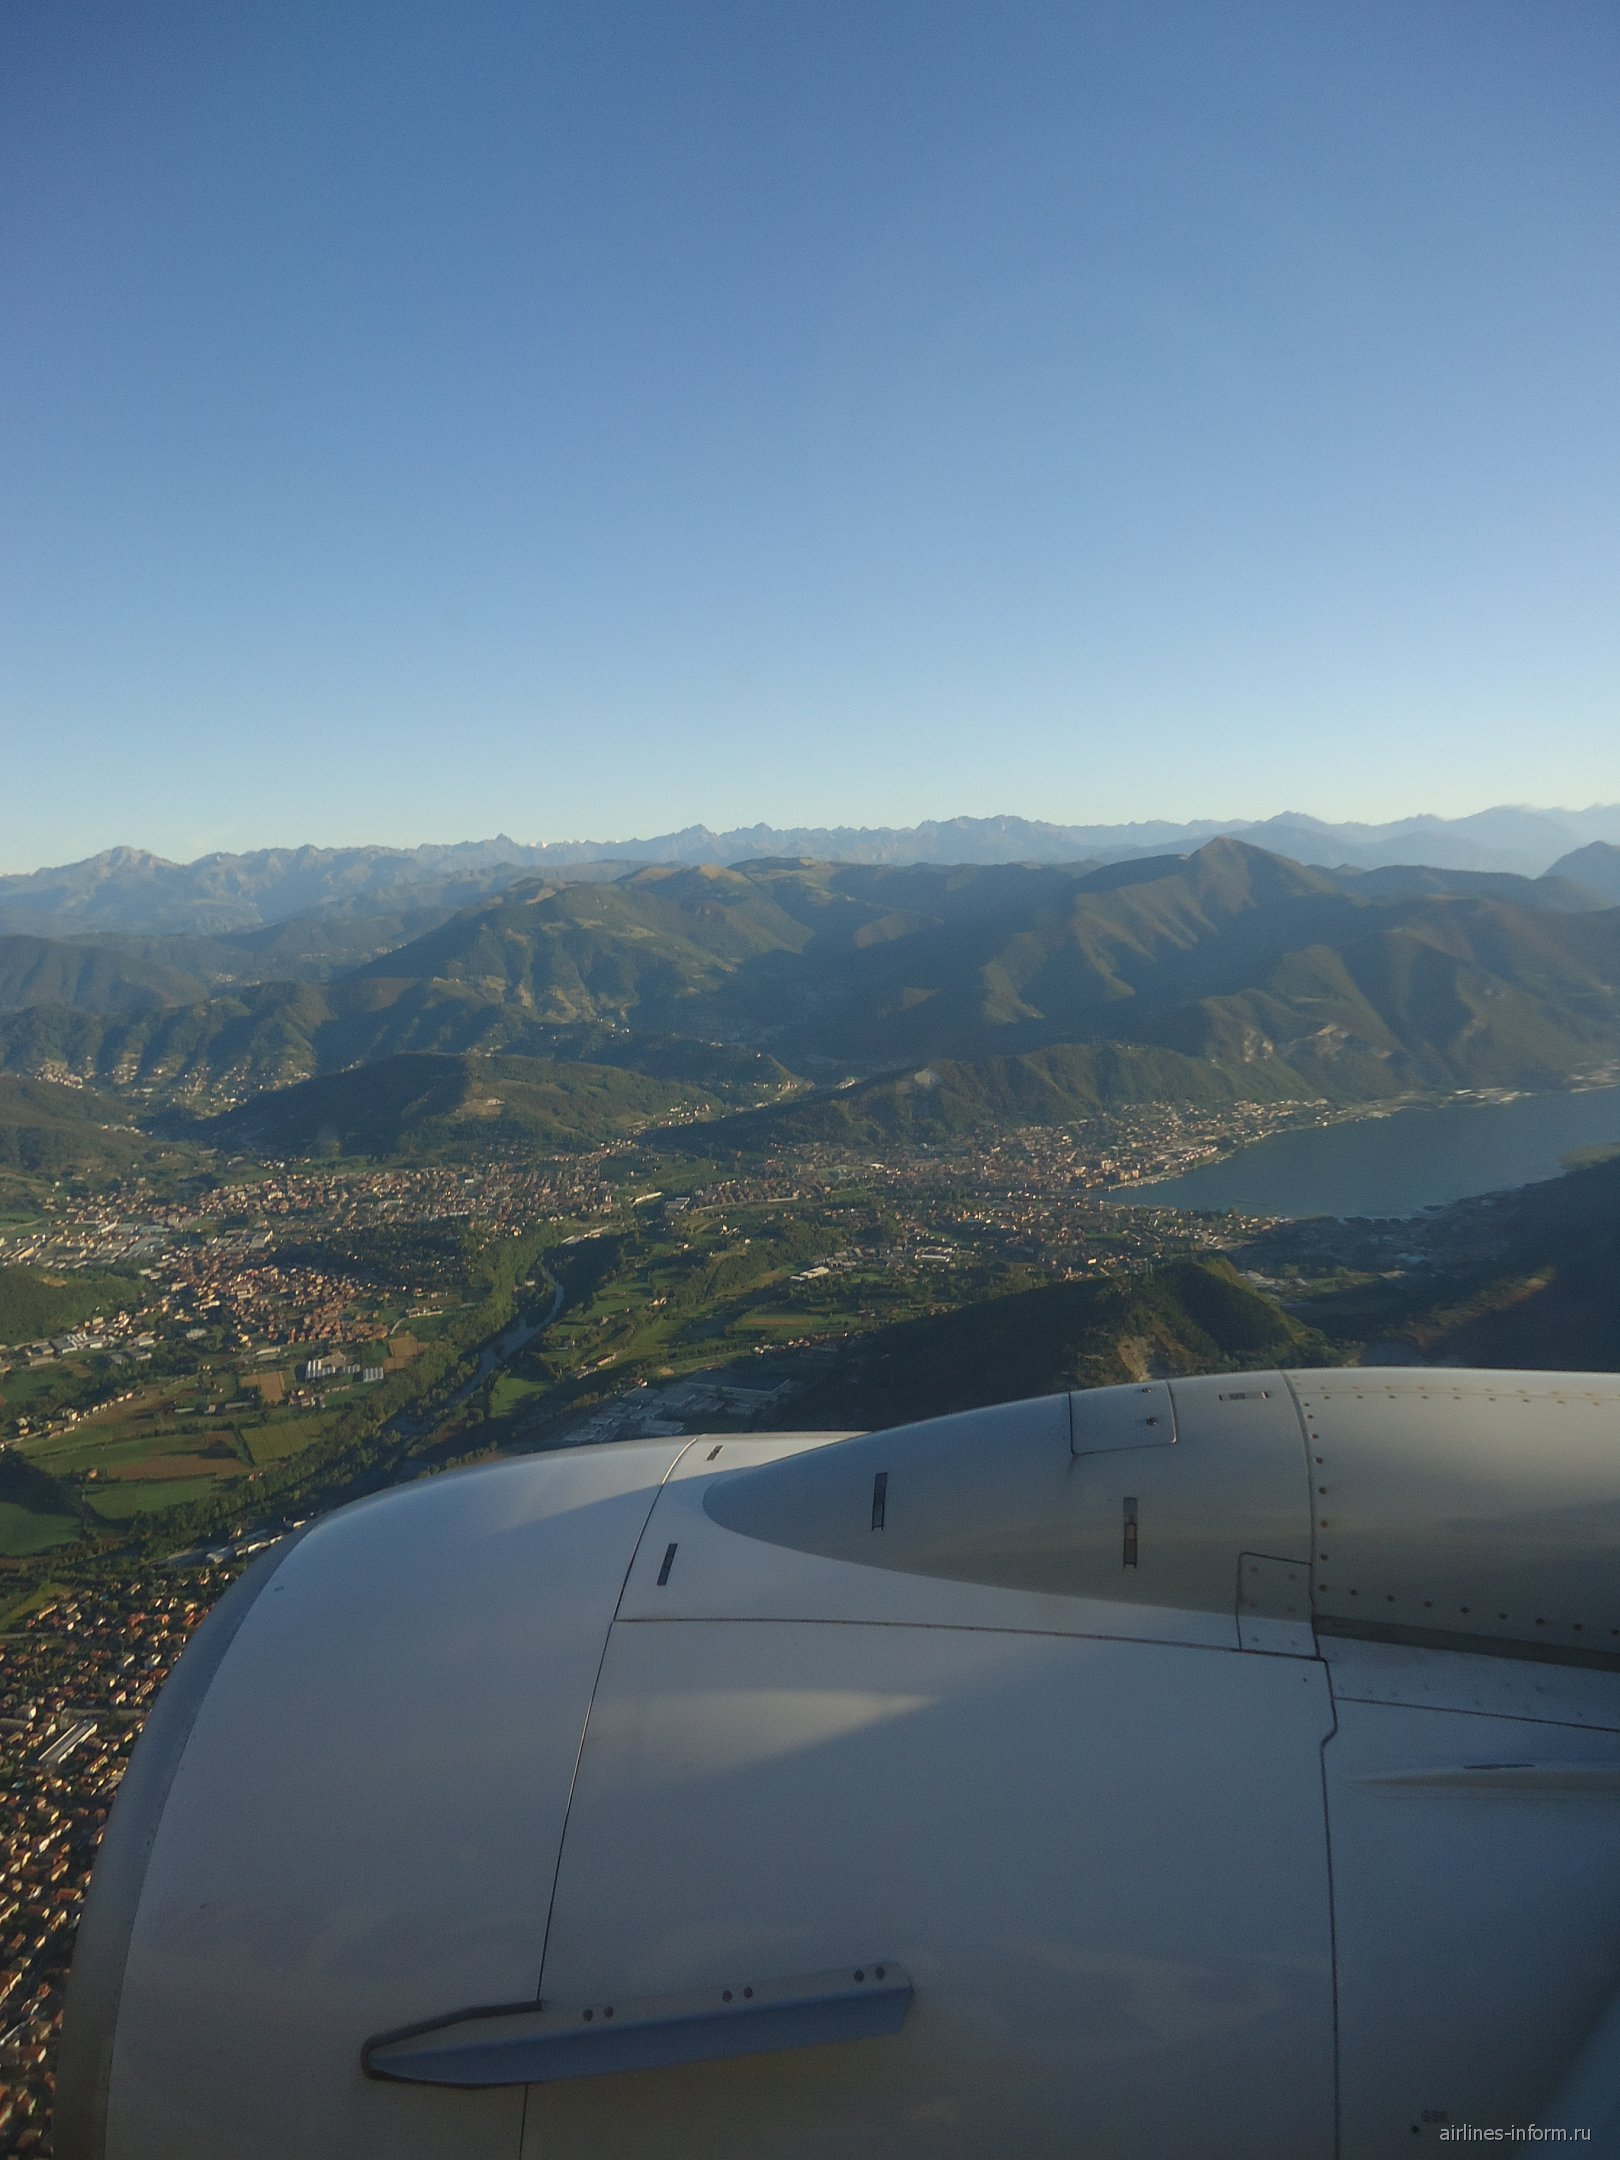 Перед посадкой в аэропорту Бергамо